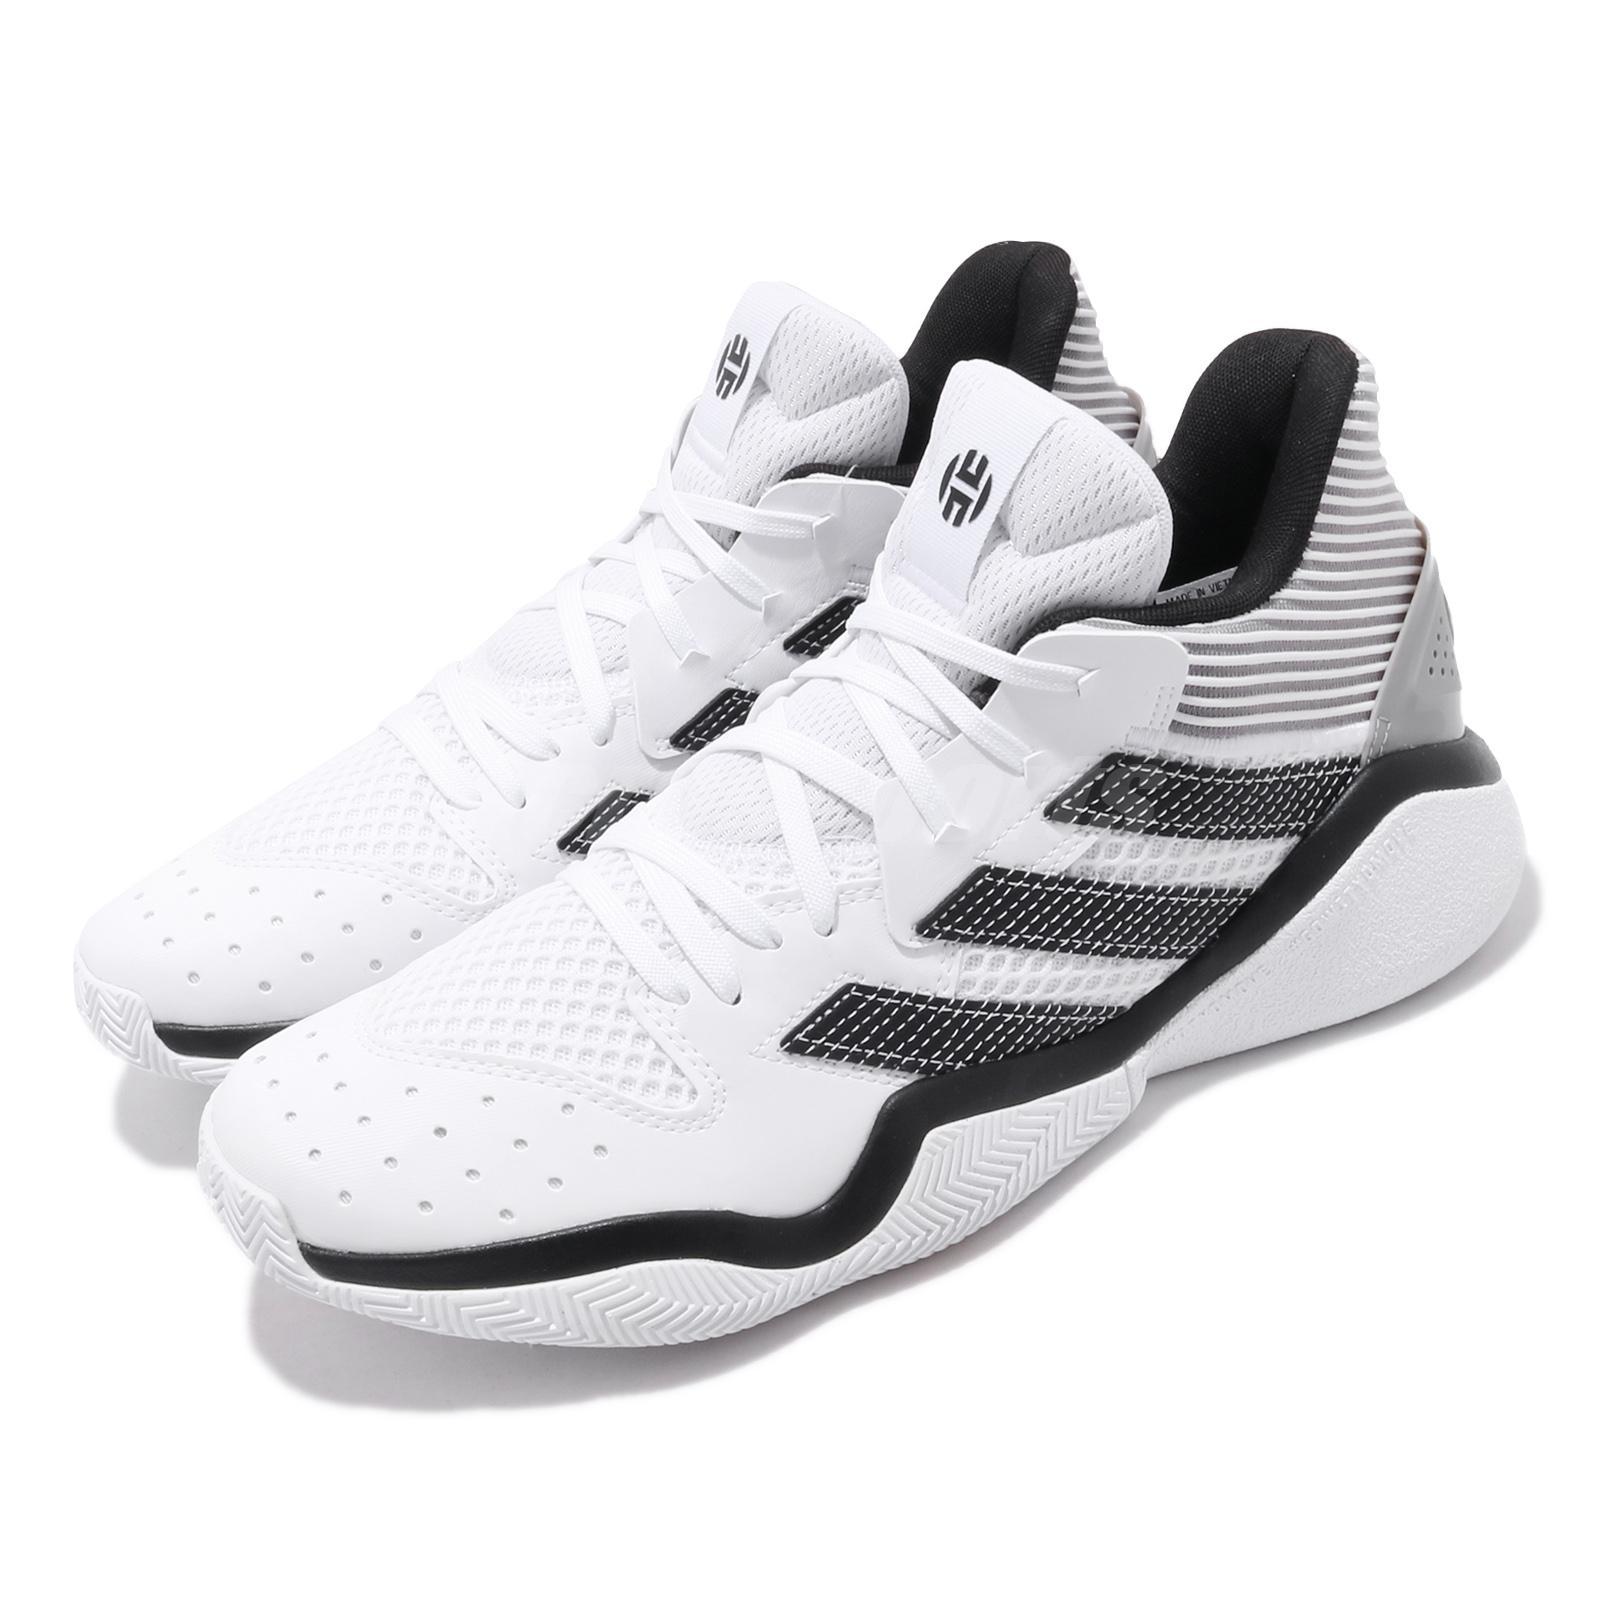 chaussure adidas james harden